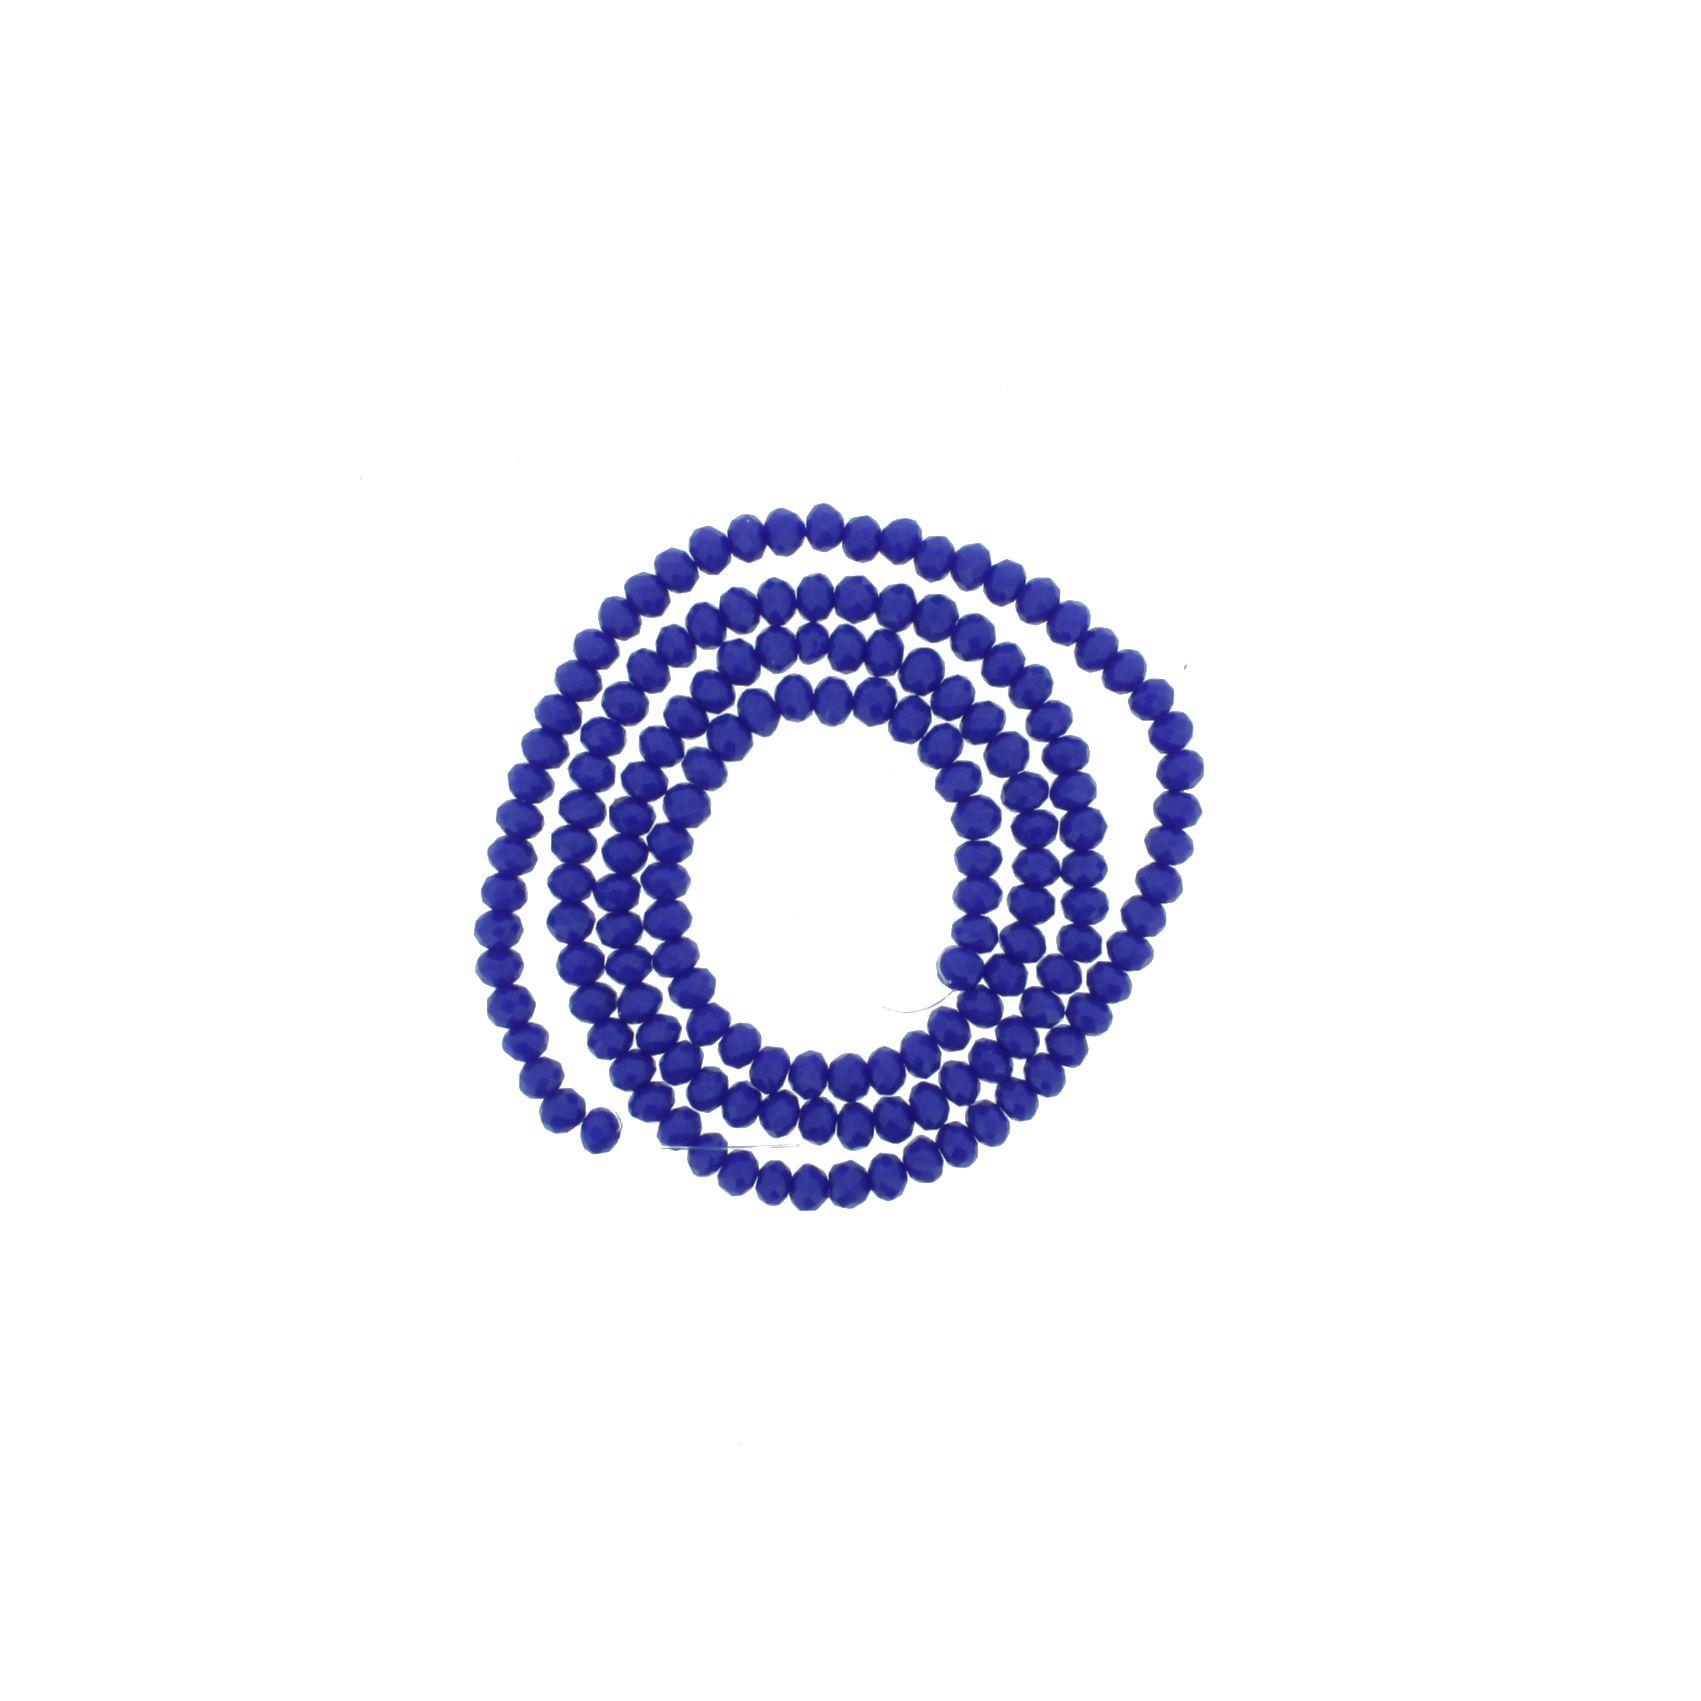 Fio de Cristal - Piatto® - Azul Royal - 4mm  - Universo Religioso® - Artigos de Umbanda e Candomblé